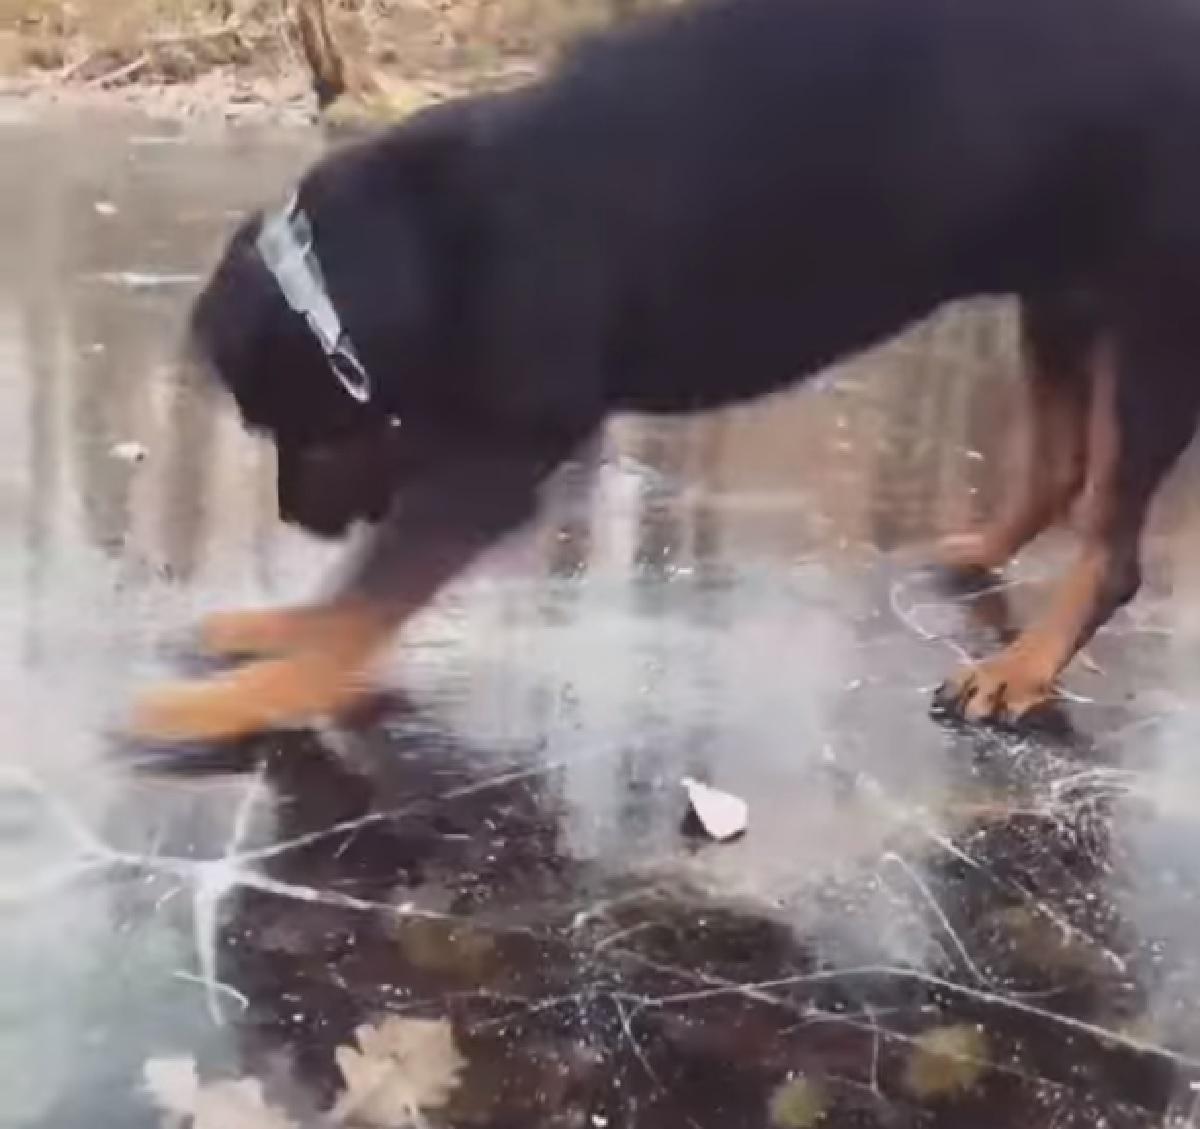 cucciolo rottweiler lago ghiaccio salti